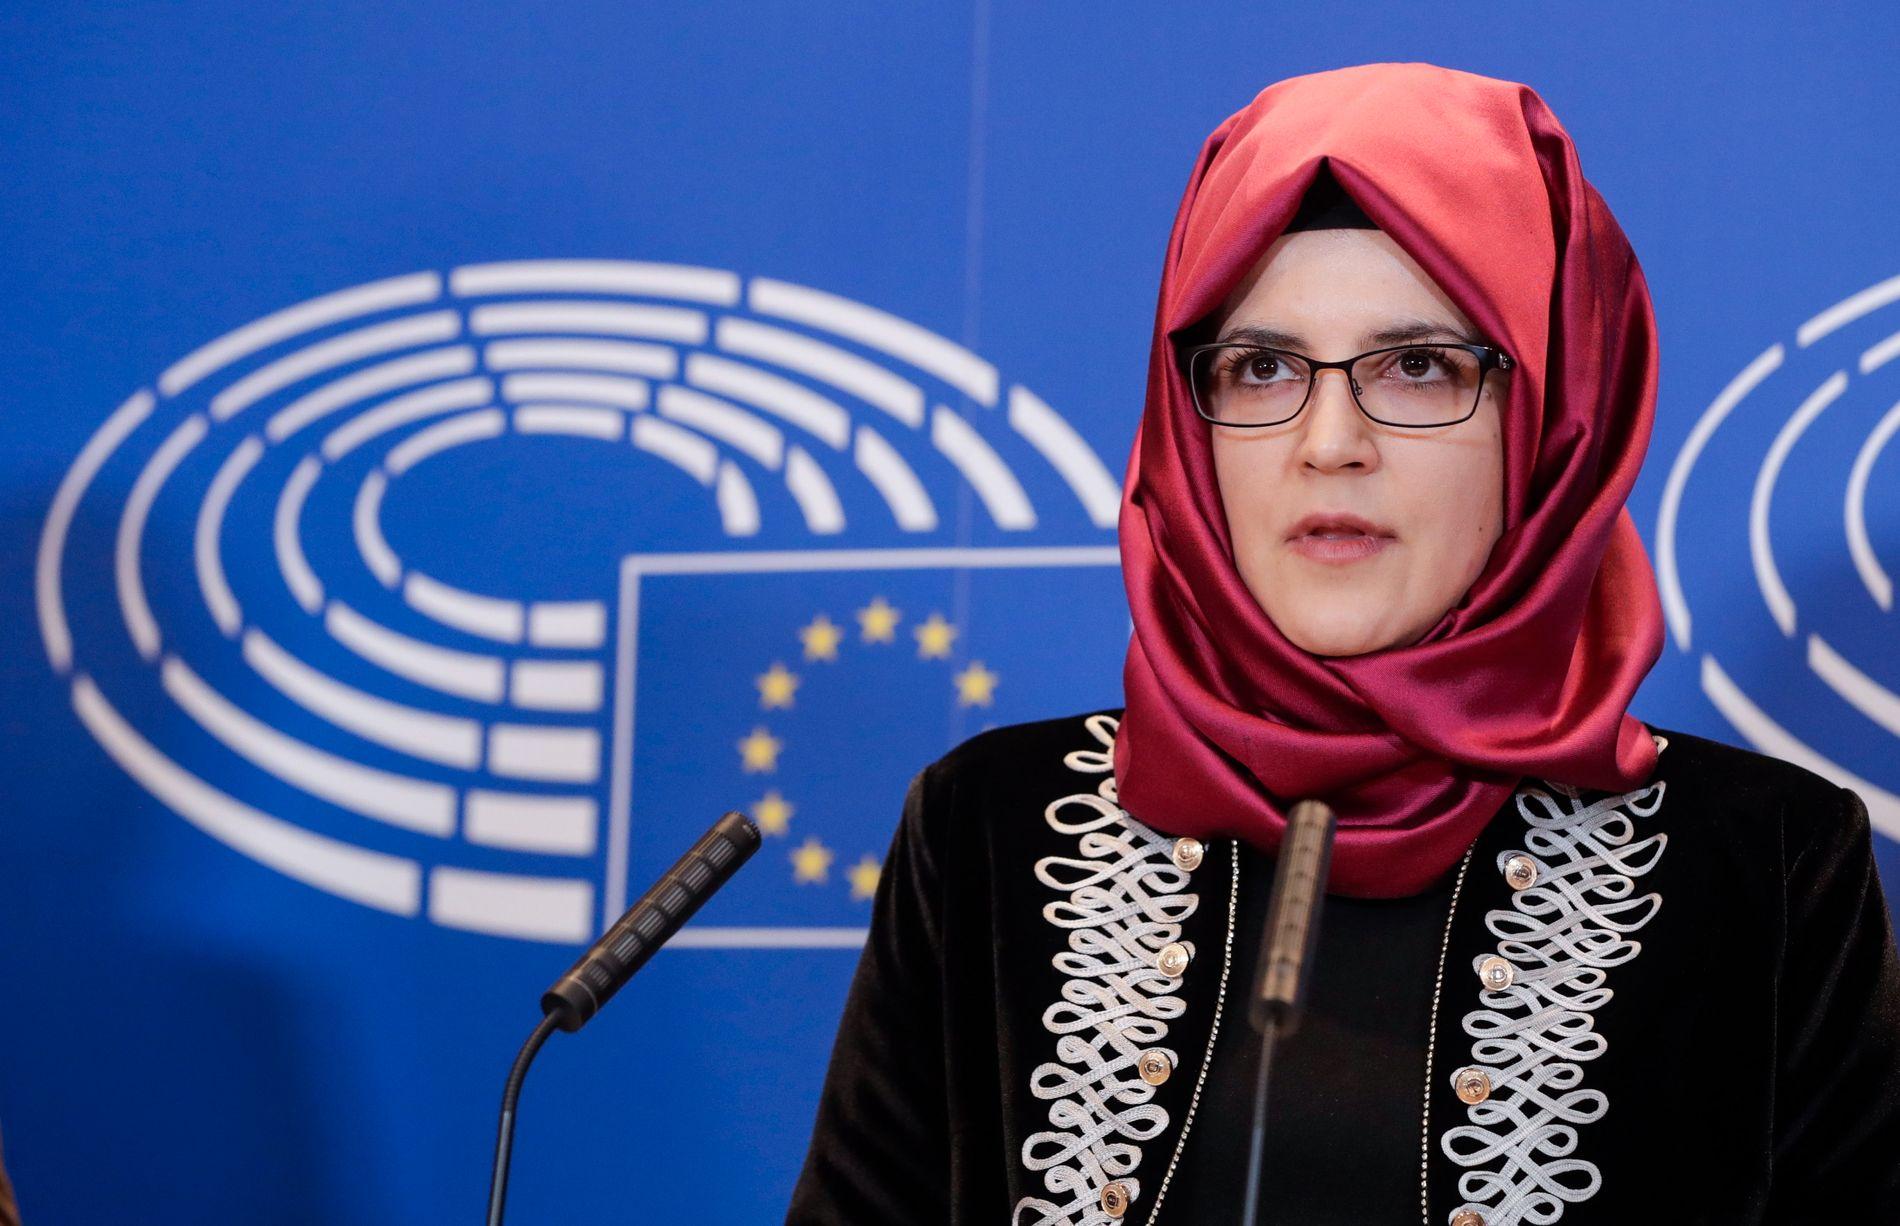 TALTE FOR EU: I februar talte Hatice for Europaparlamentet i Brussel.